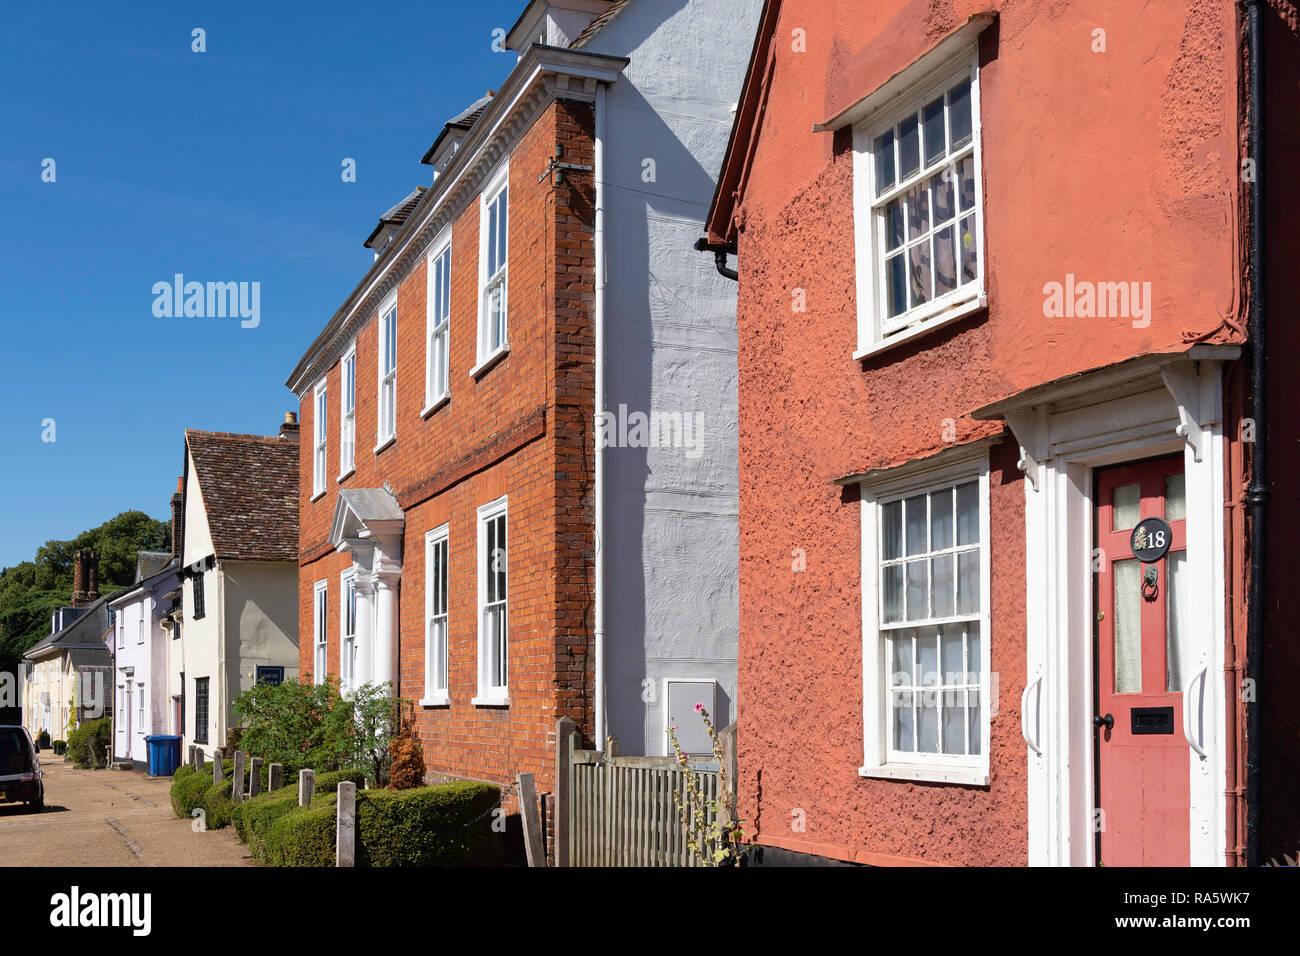 Period houses, Nethergate Street, Clare, Suffolk, England, United Kingdom - Stock Image